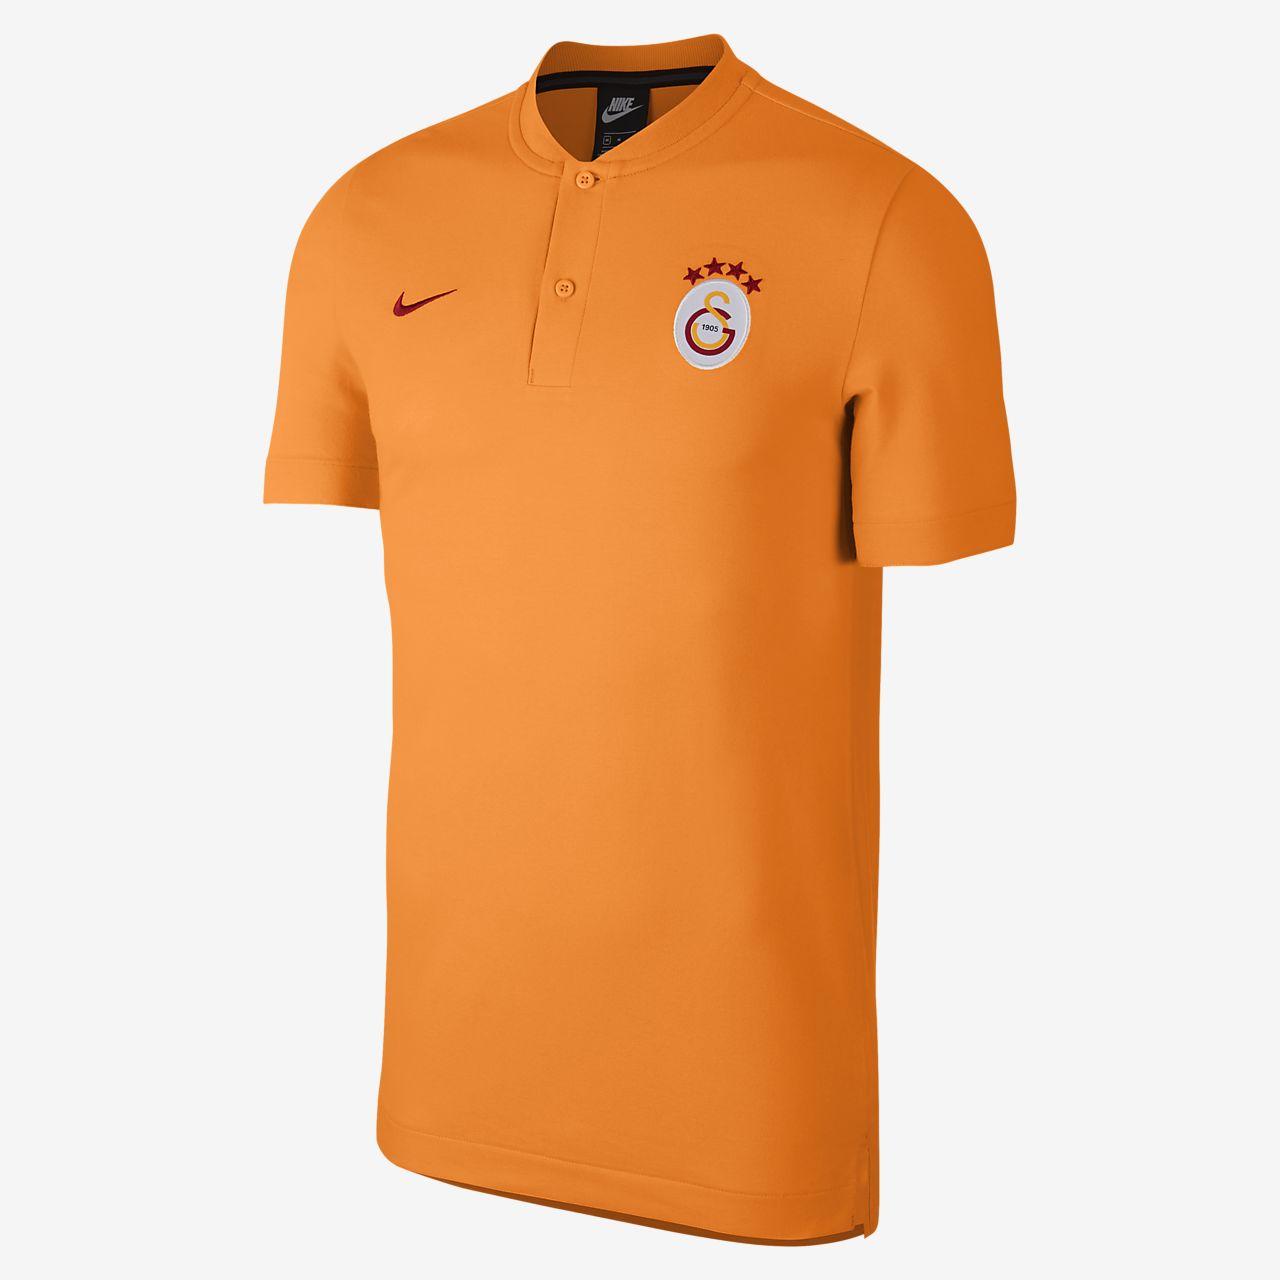 Galatasaray-fodboldpolo til mænd